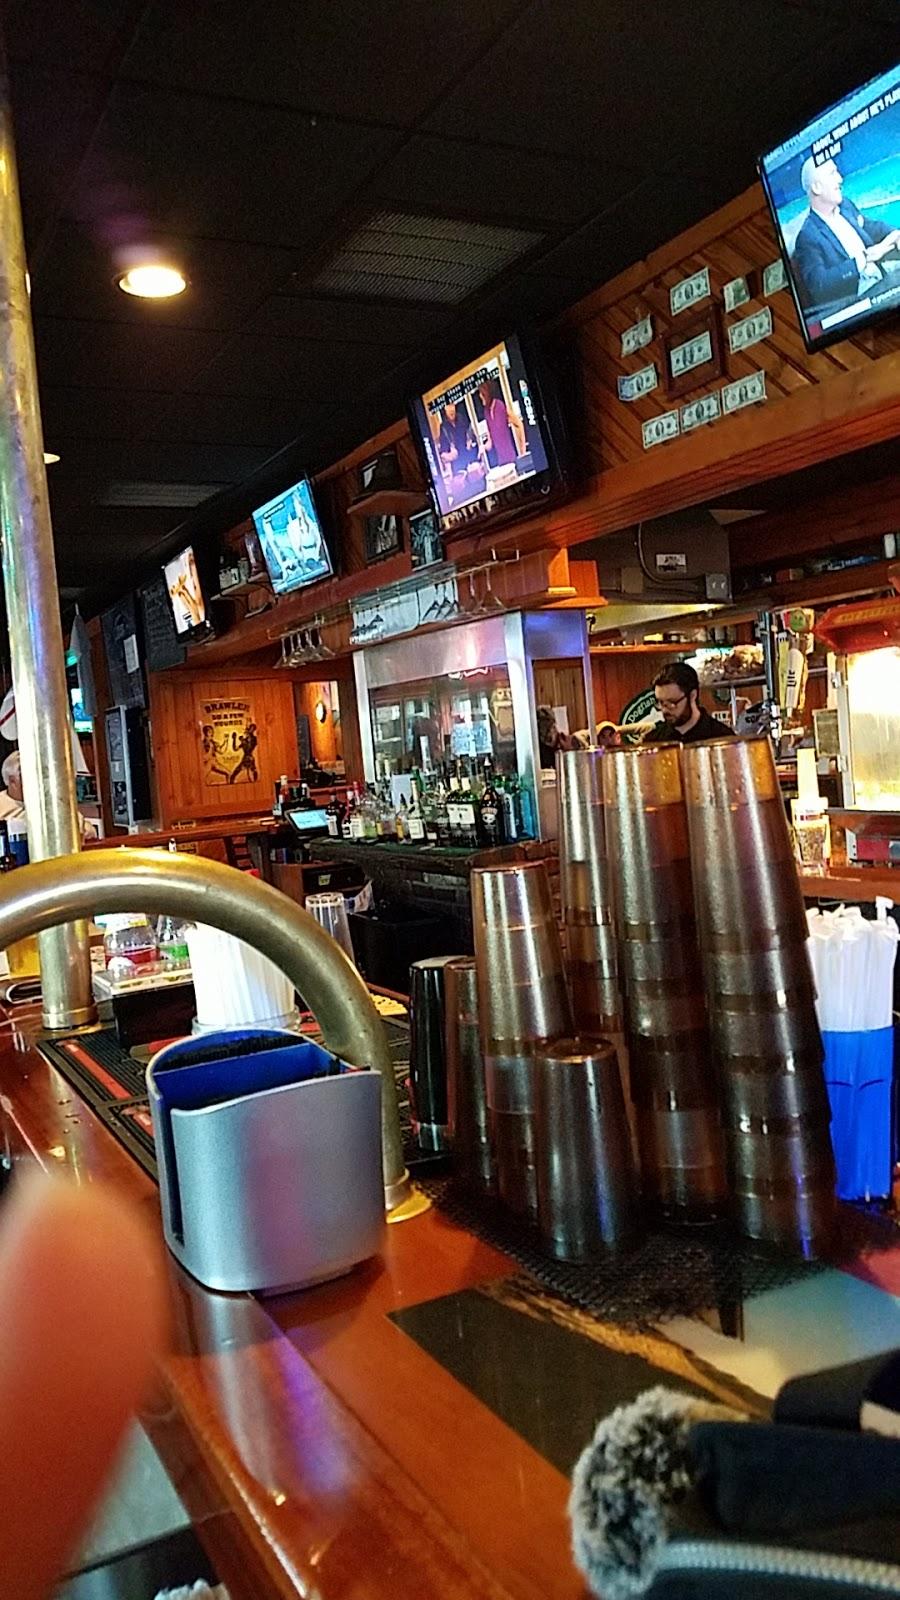 The Broadway Bar & Grill - restaurant  | Photo 1 of 10 | Address: 106 Randall Ave, Point Pleasant Beach, NJ 08742, USA | Phone: (732) 899-3272